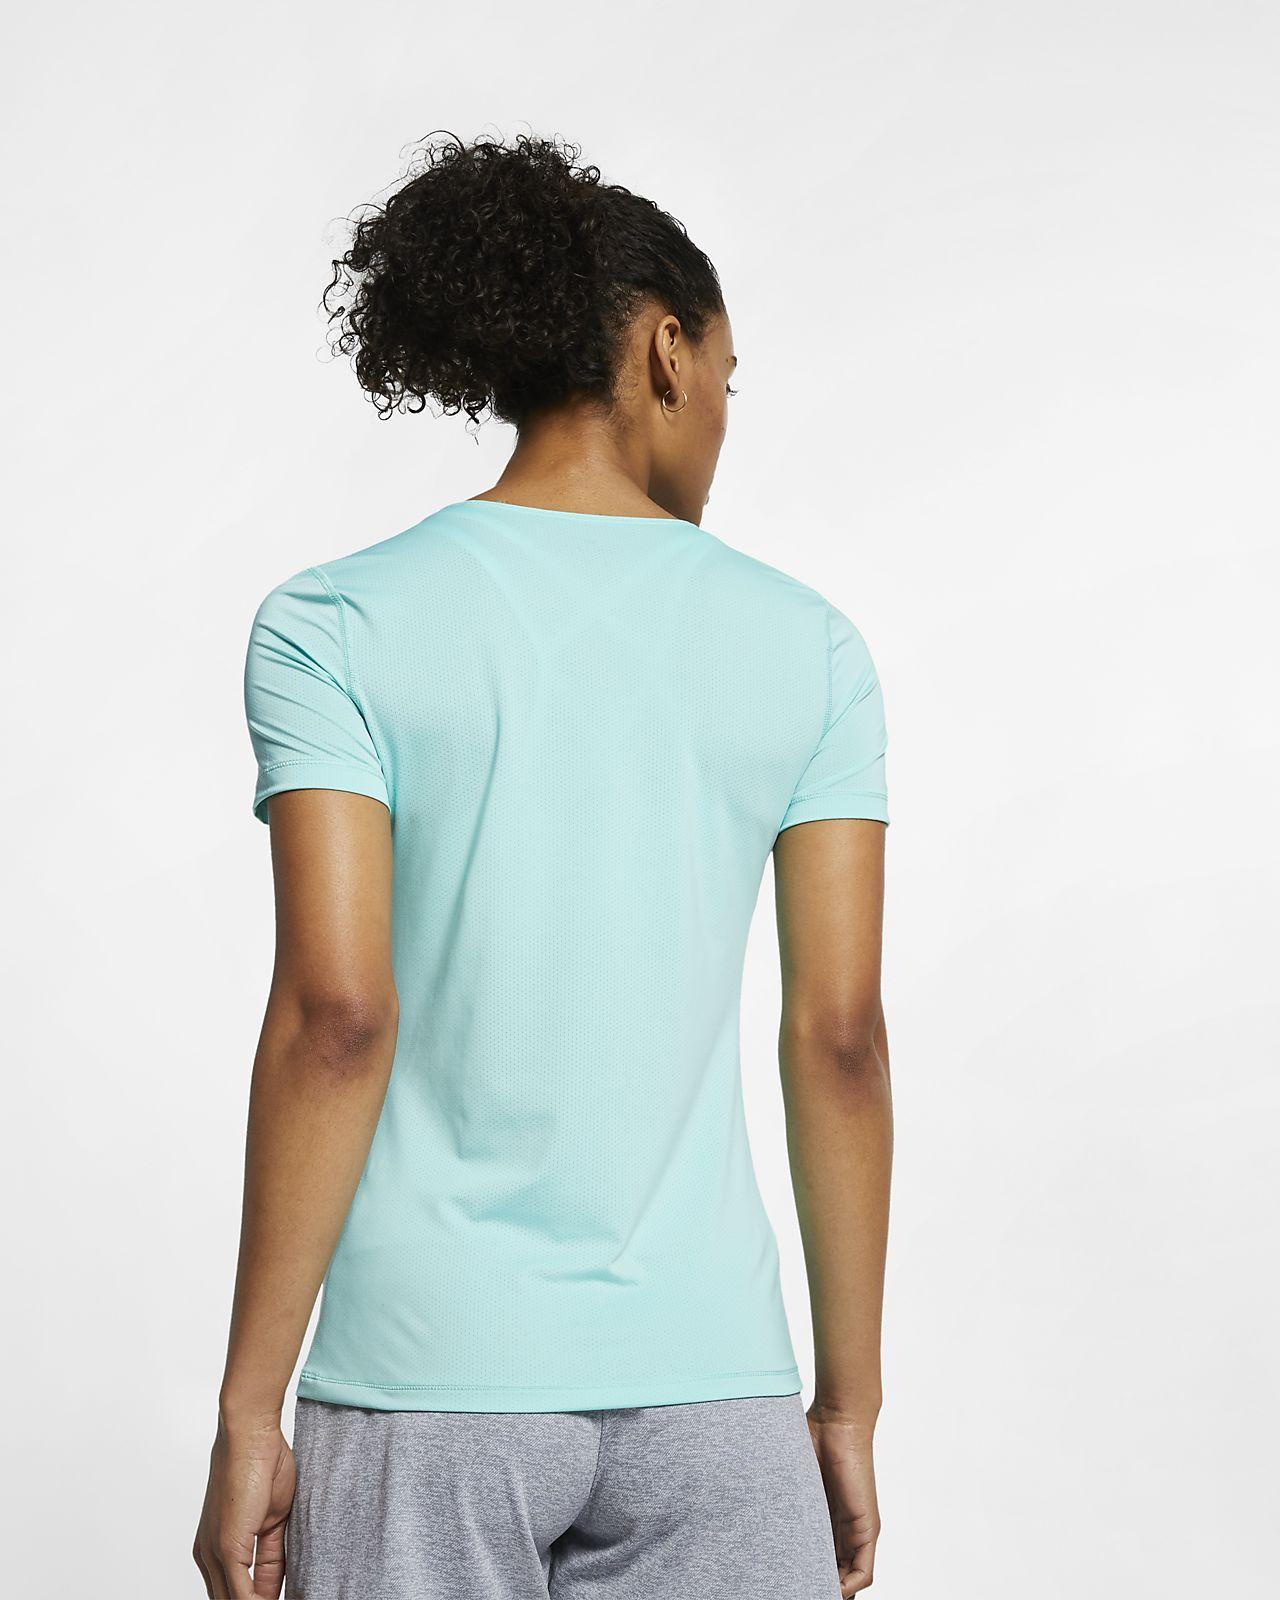 ab68e704e9b6 Γυναικεία κοντομάνικη μπλούζα προπόνησης από διχτυωτό υλικό Nike Pro ...